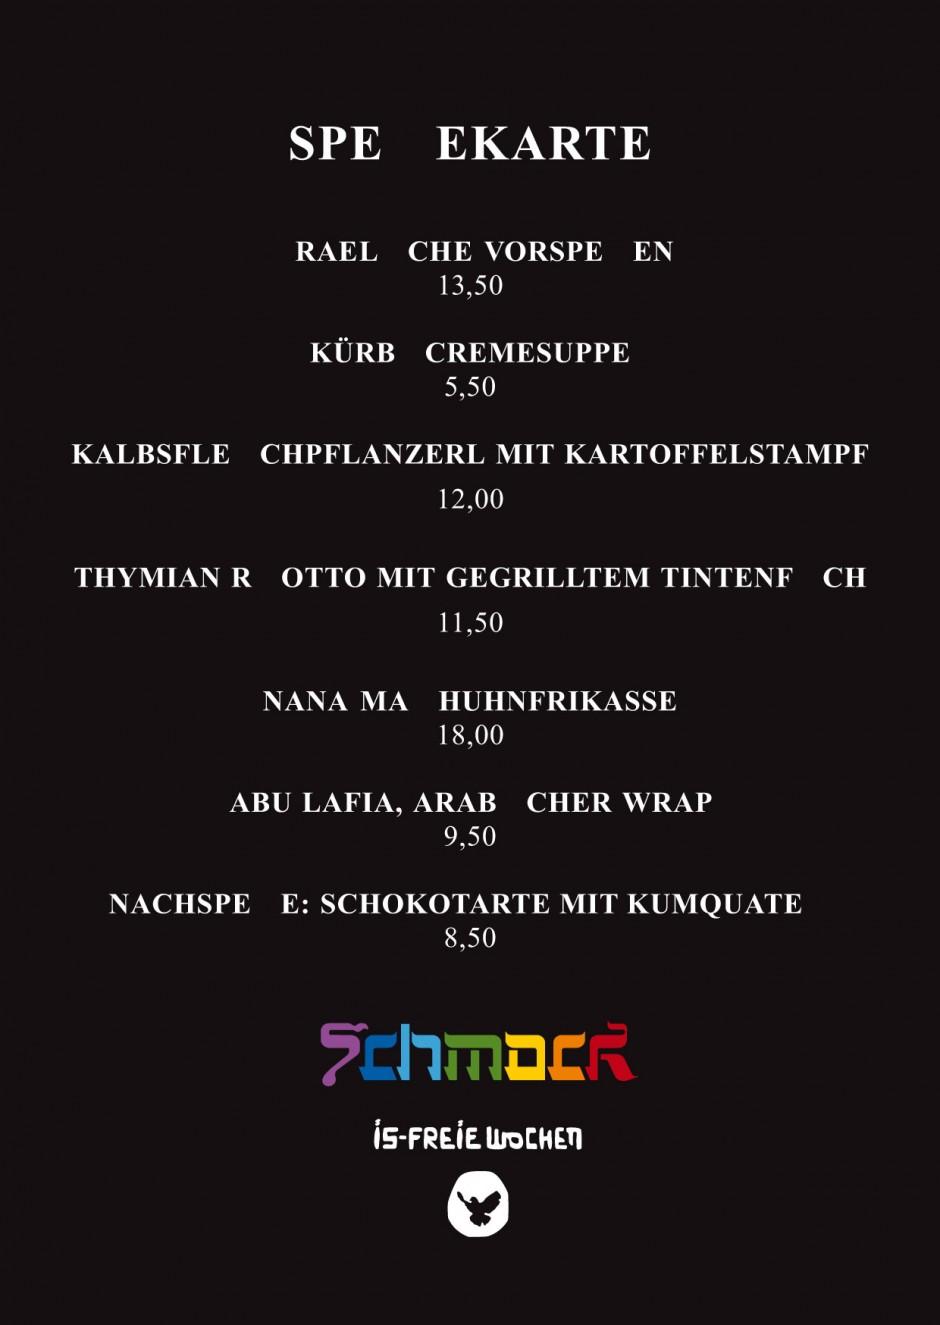 KR_141103_Schmock_04